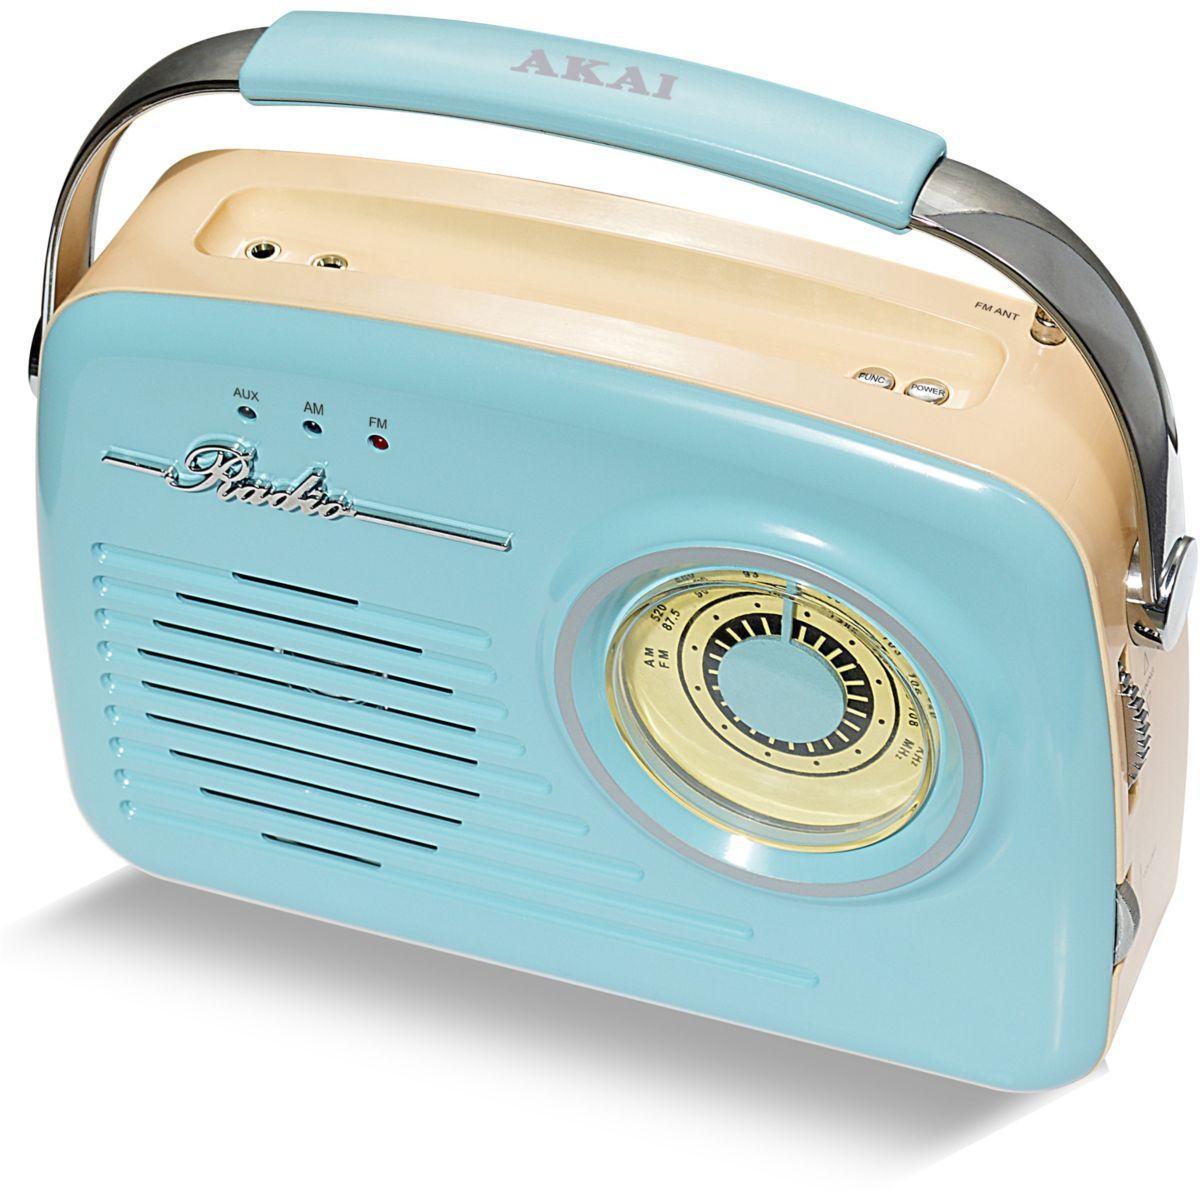 Radio analogique AKAI AR-78 bleu